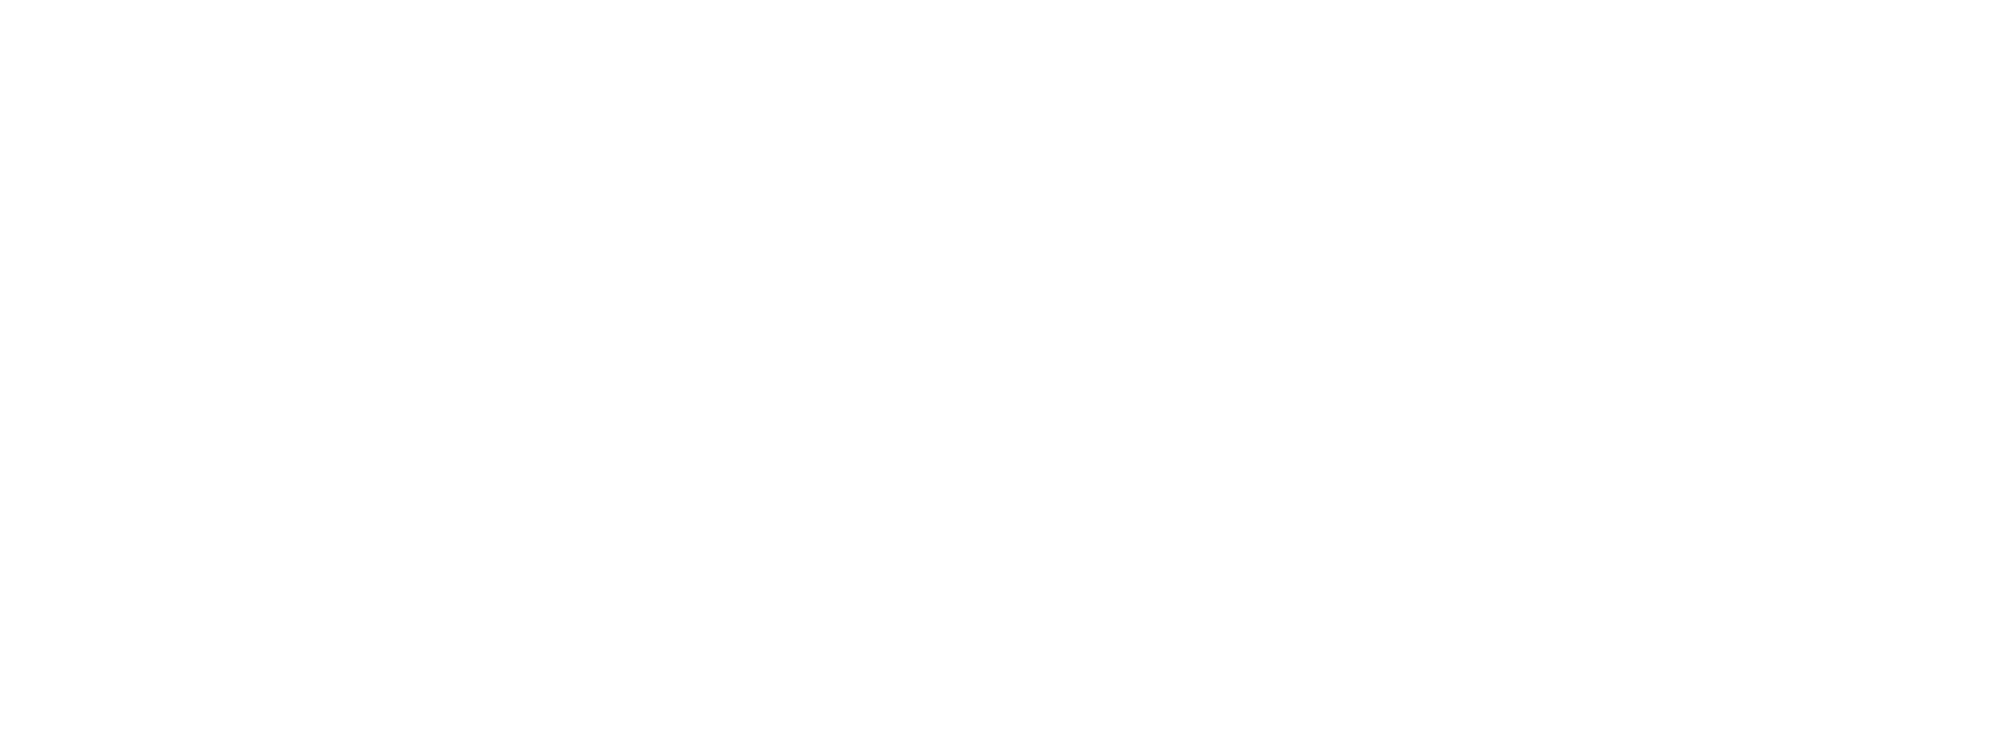 Logo for Dine Rewards, the loyalty program of Outback Steakhouse.